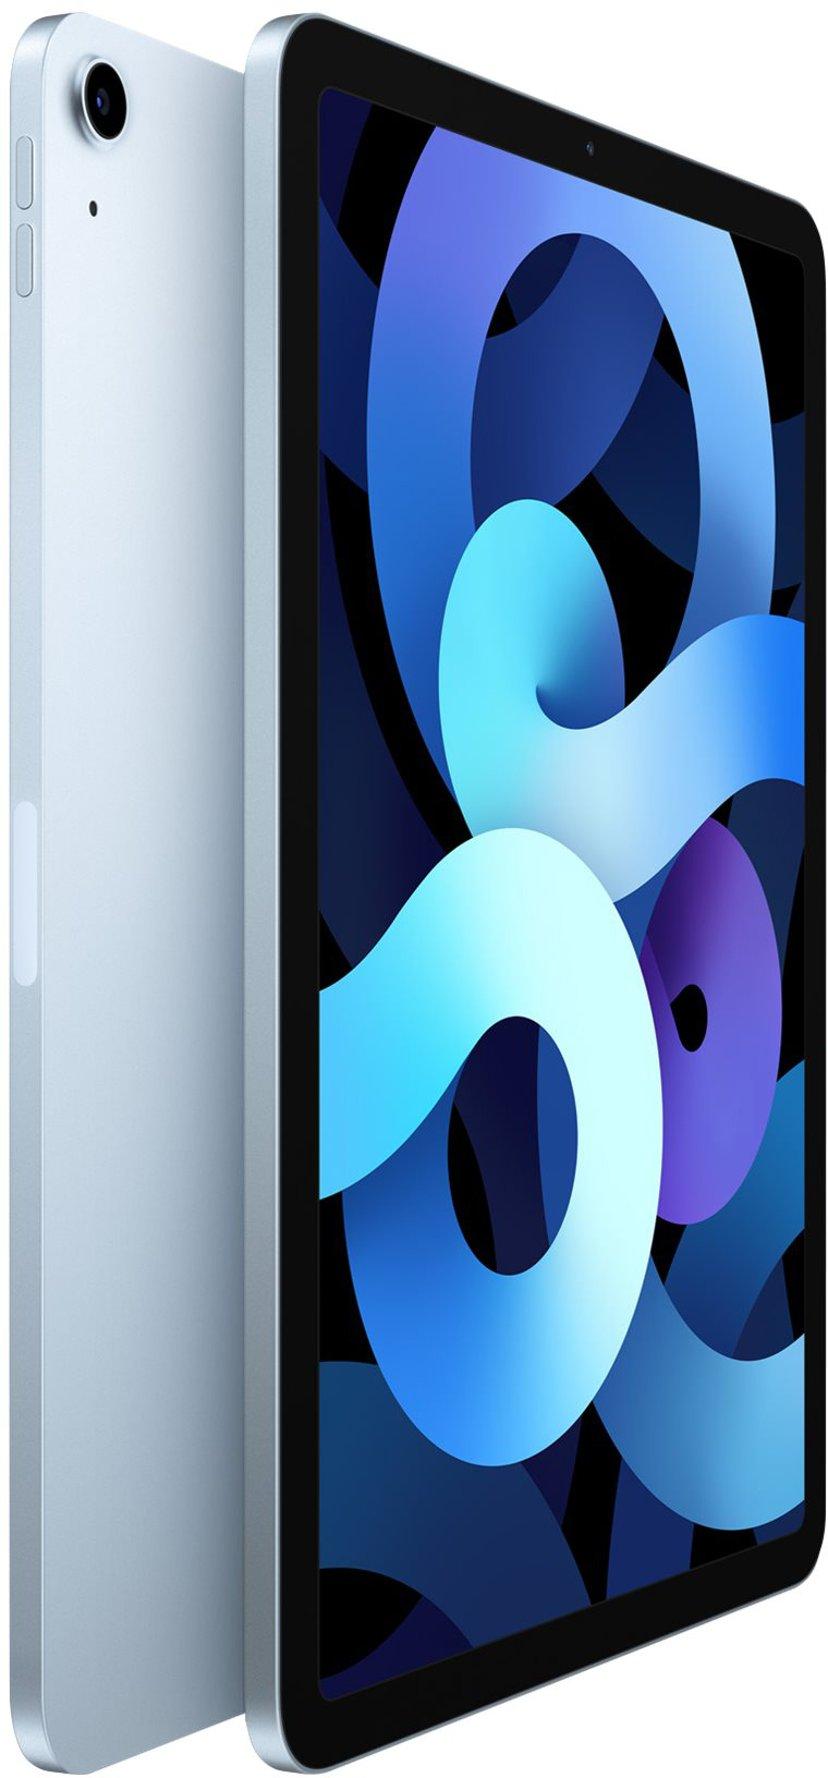 "Apple iPad Air 4th gen (2020) WiFi + Cellular 10.9"" 64GB Himmelsblå"